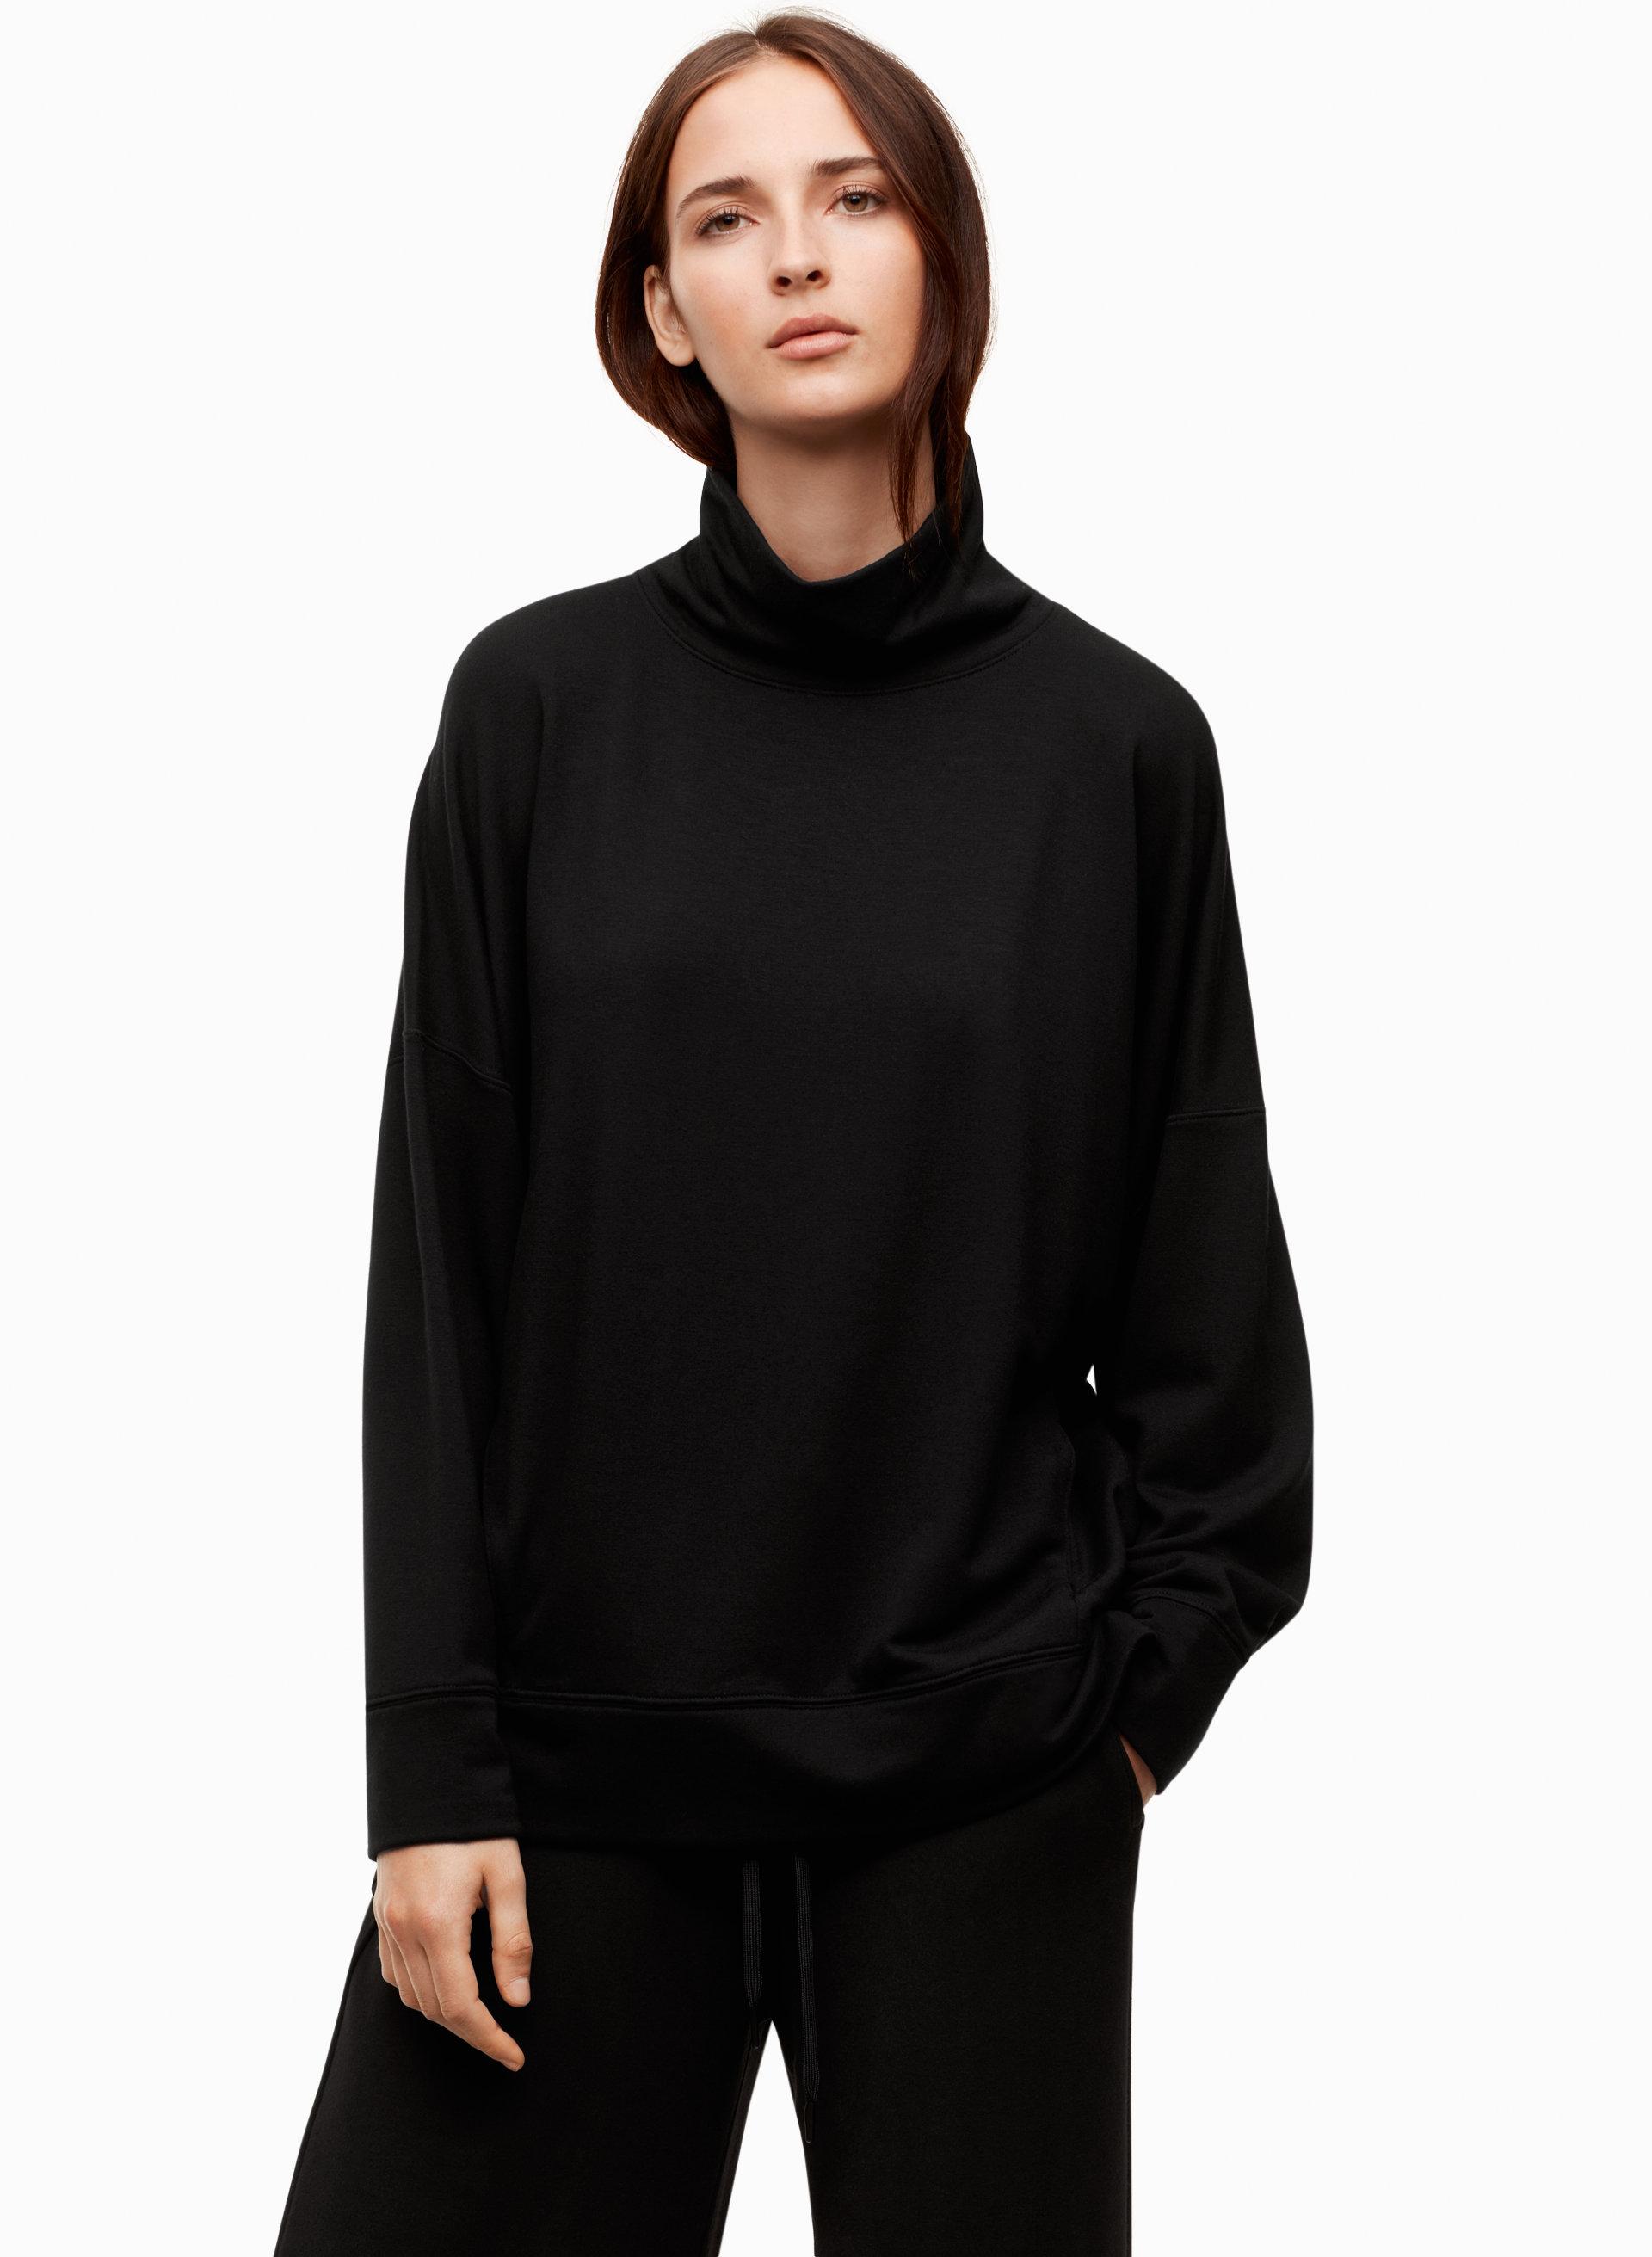 Tight Black Turtleneck Sweater